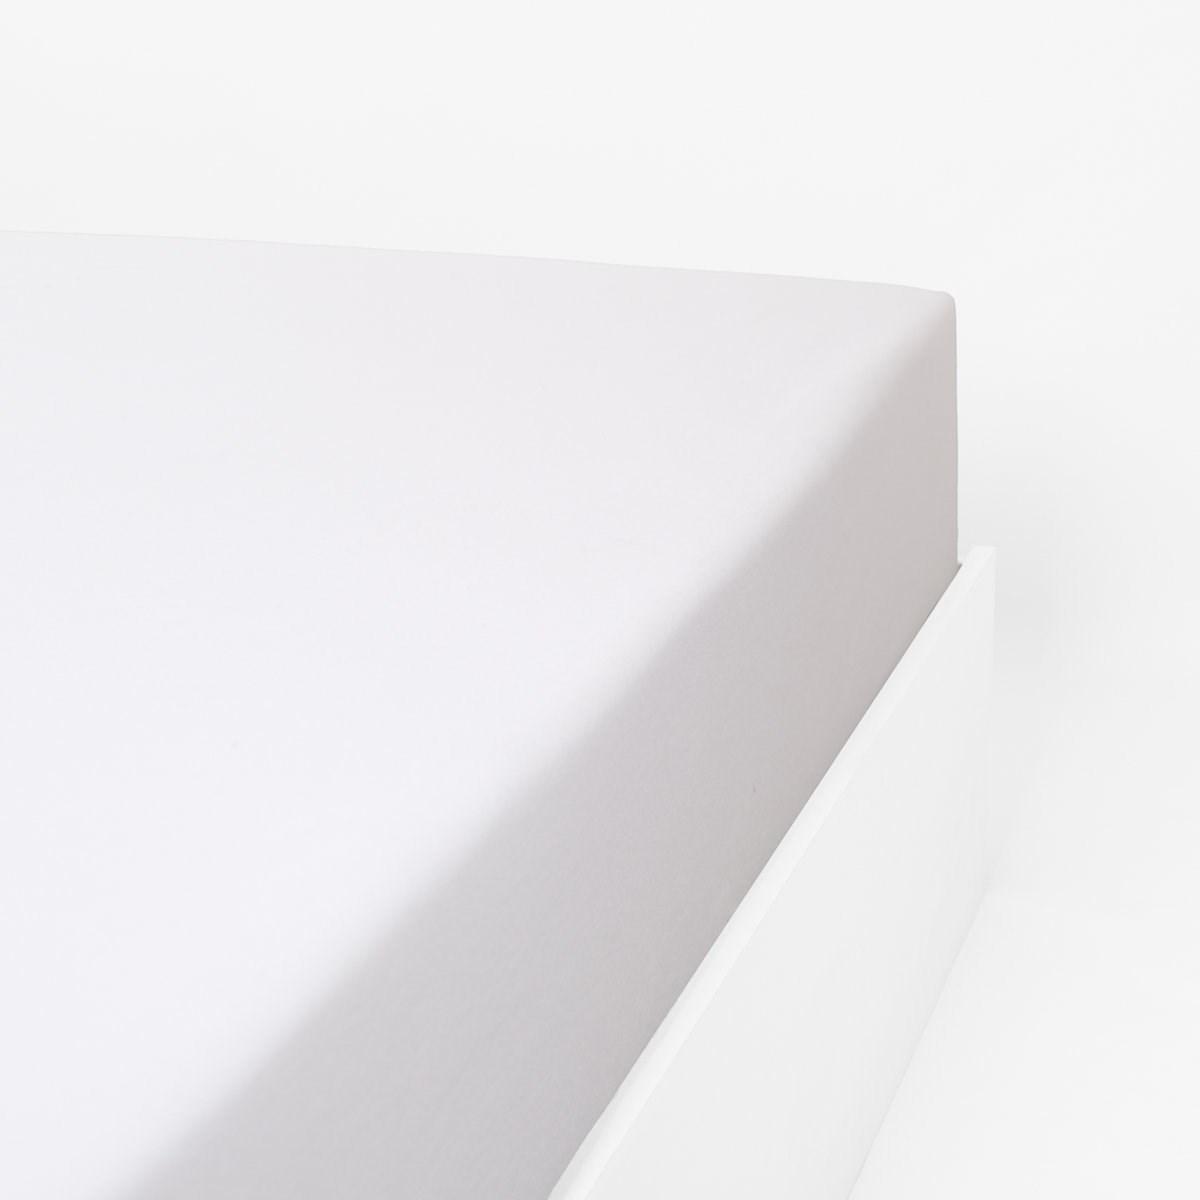 Drap housse flanelle en Molleton Blanc 160x200 cm